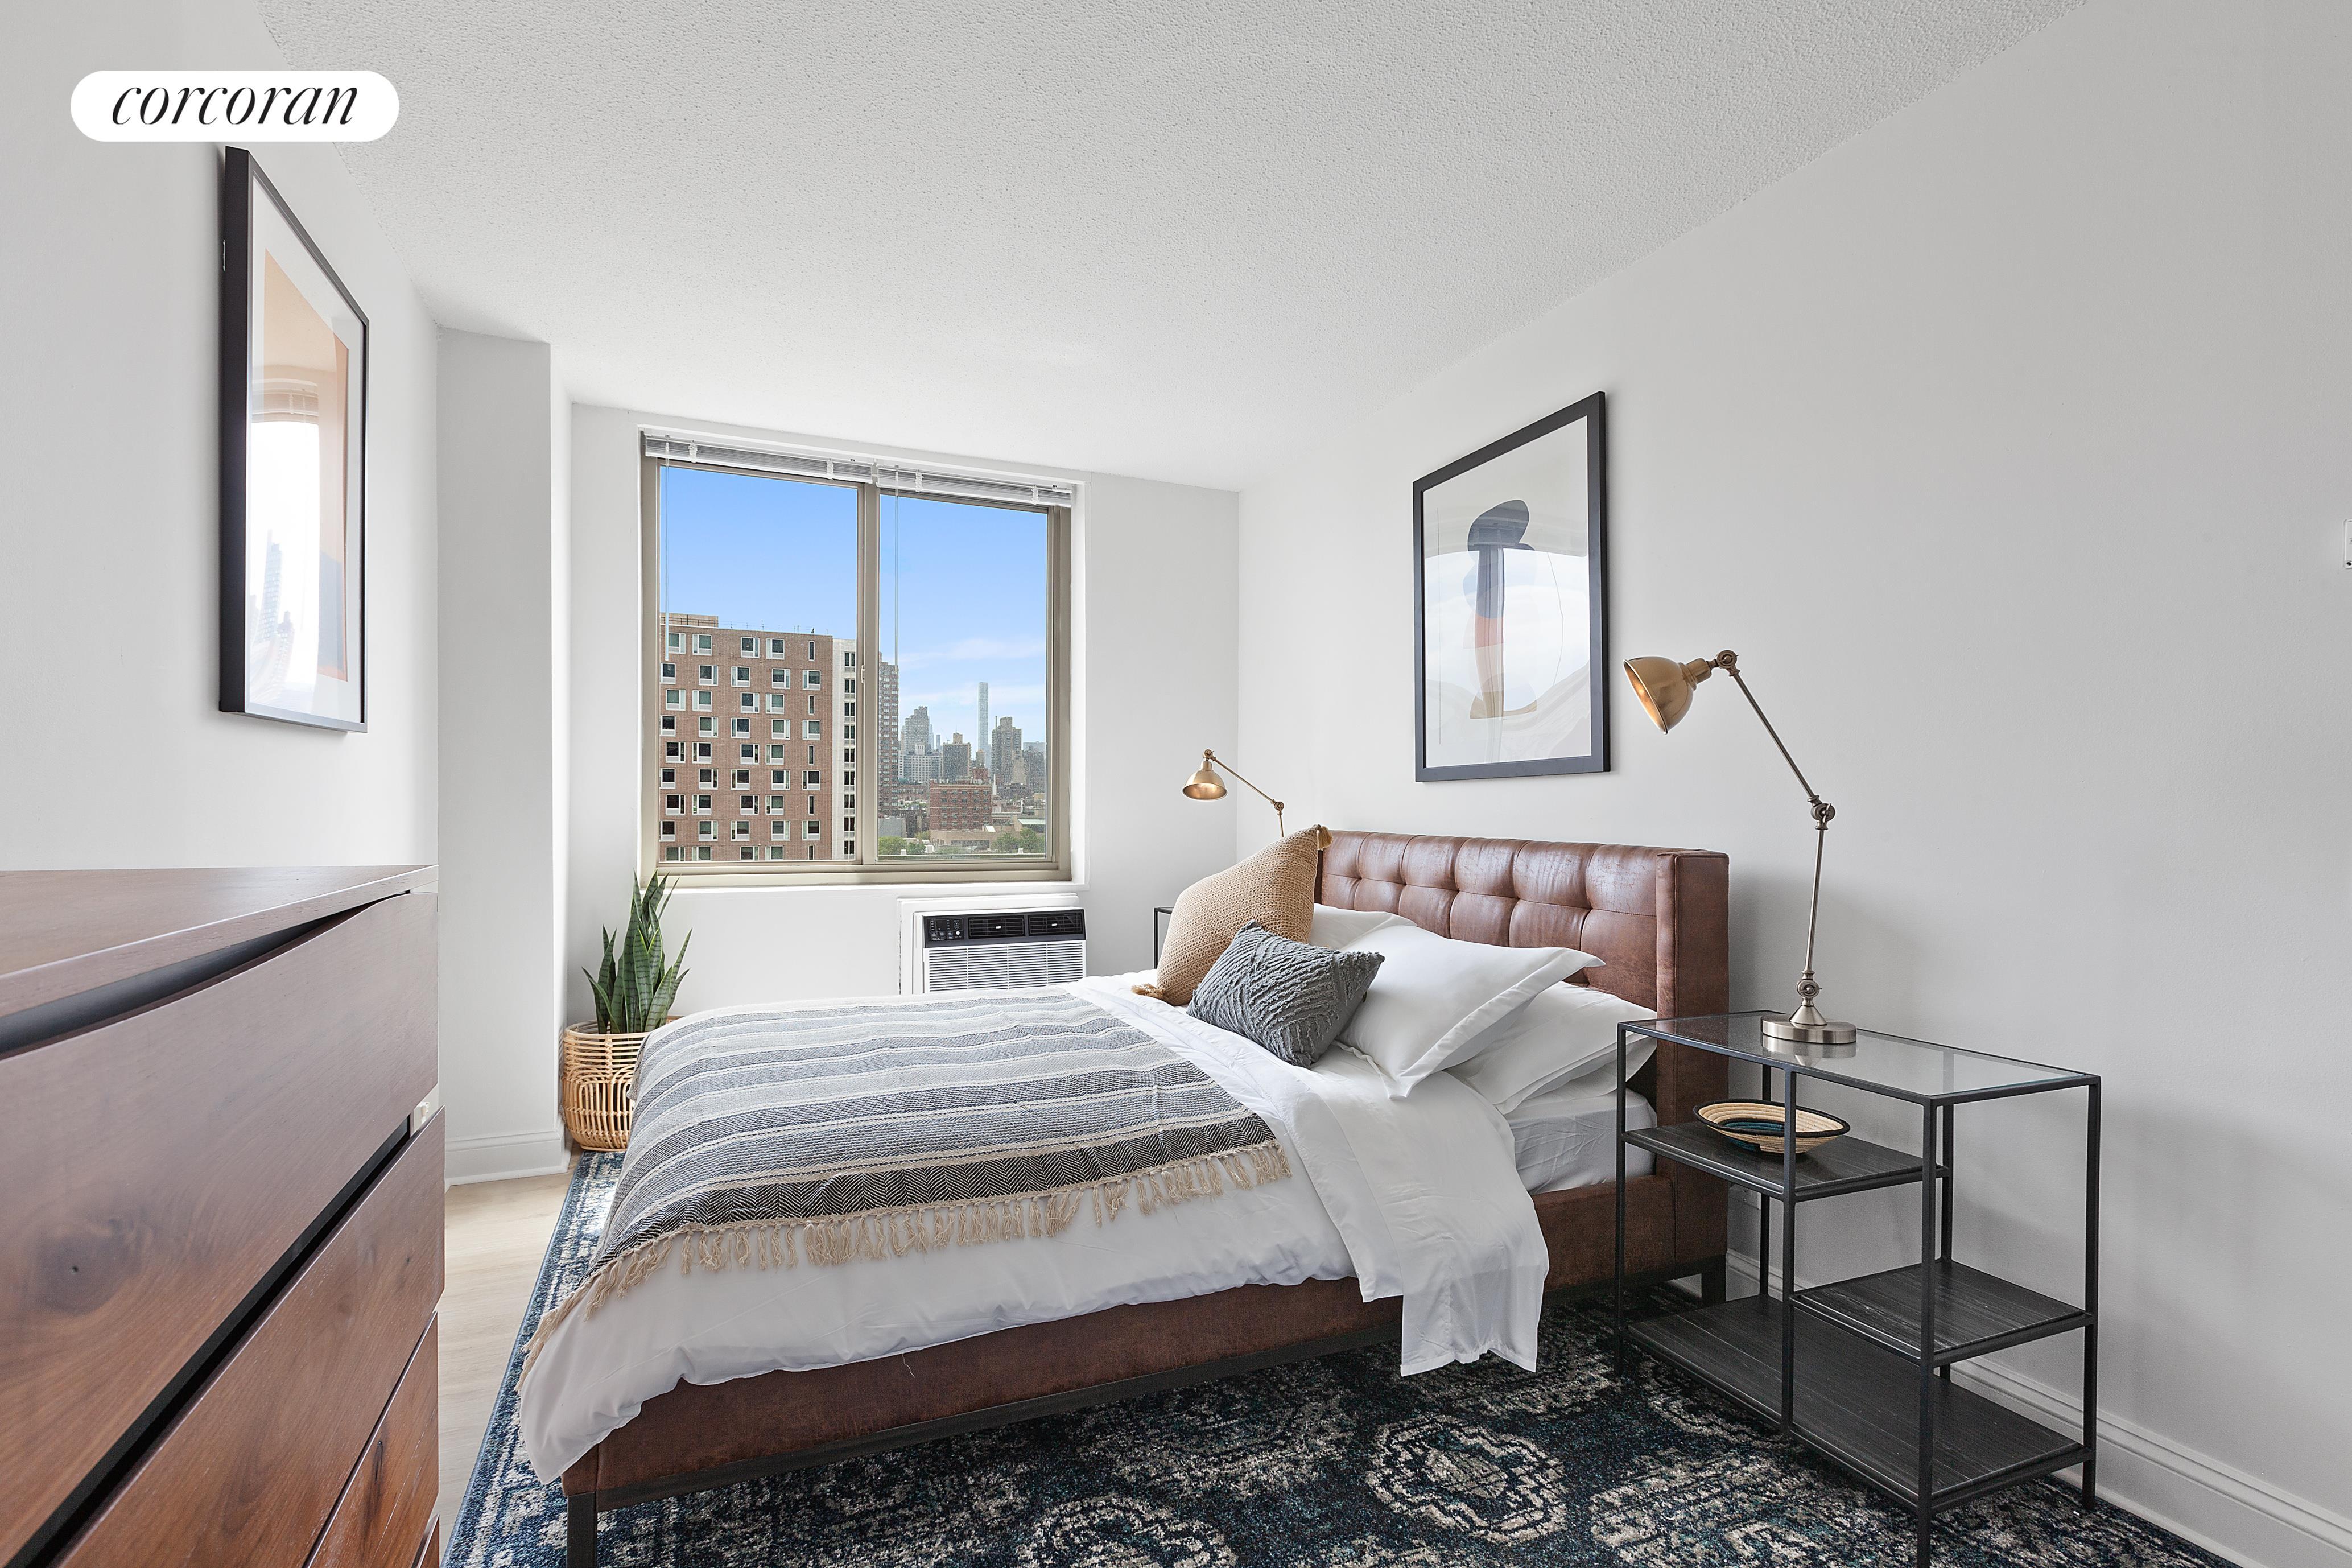 1966 First Avenue East Harlem New York NY 10028